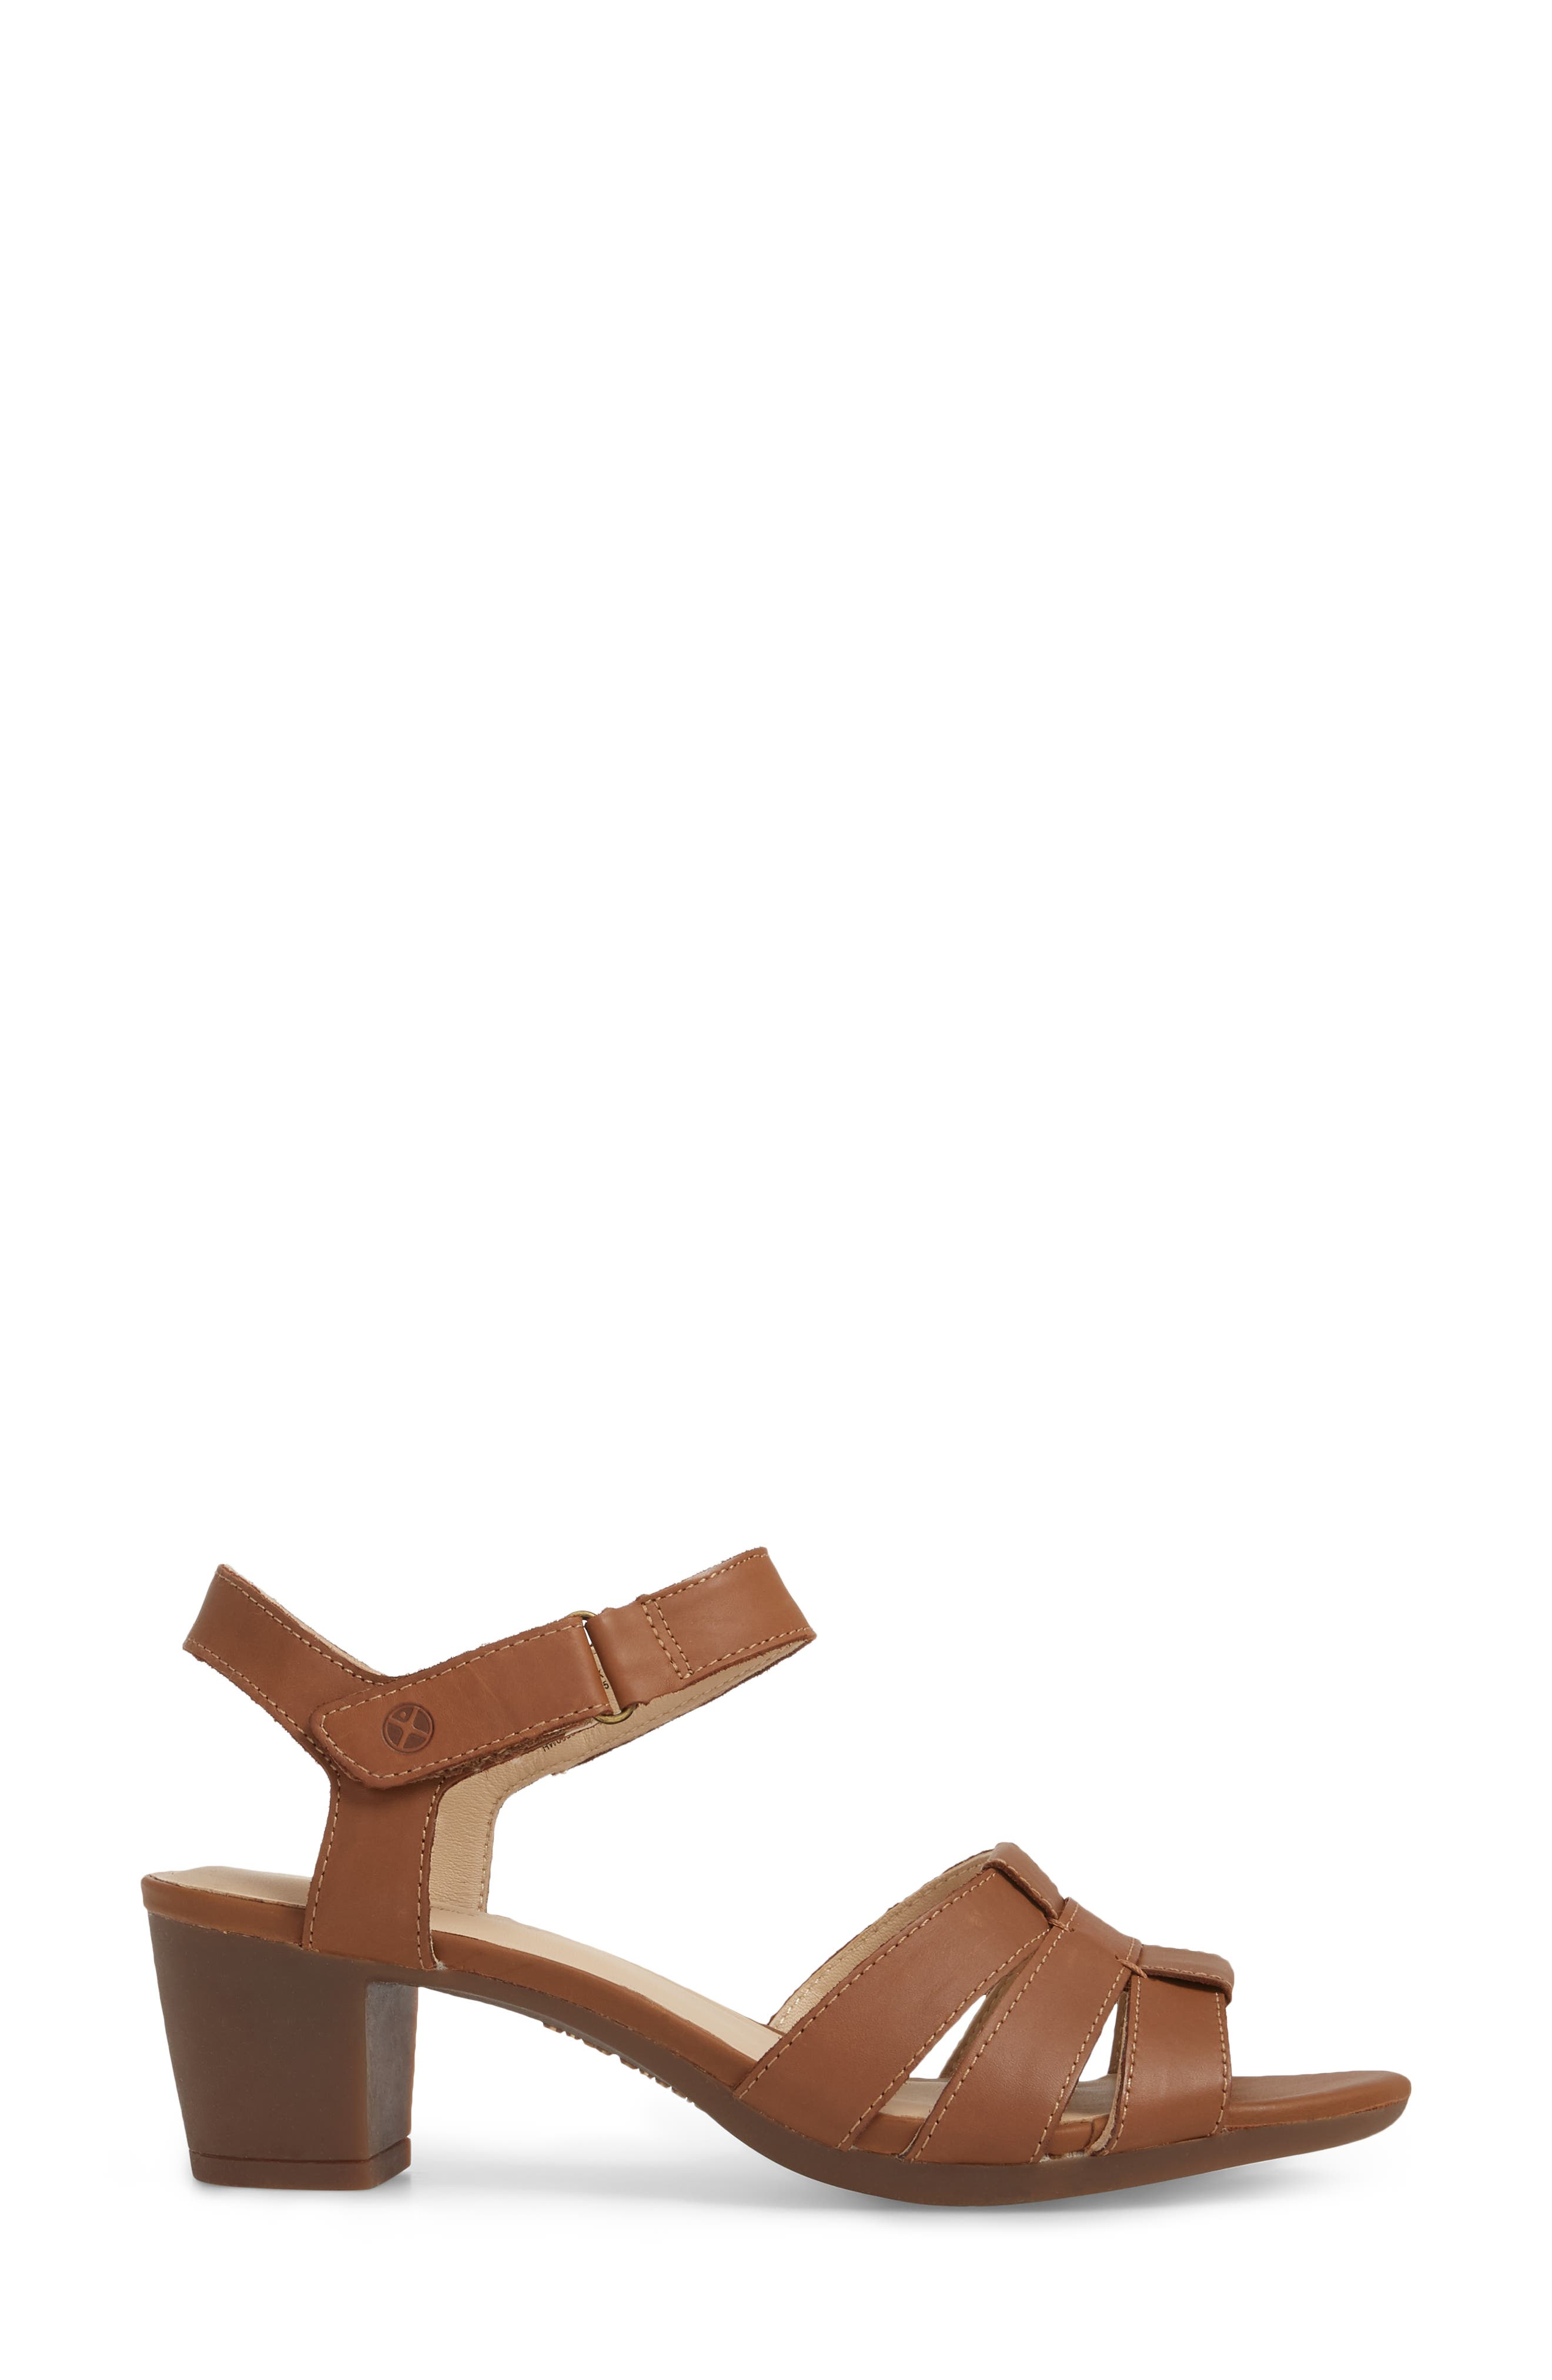 Masseter Quarter Strap Sandal,                             Alternate thumbnail 3, color,                             Tan Leather